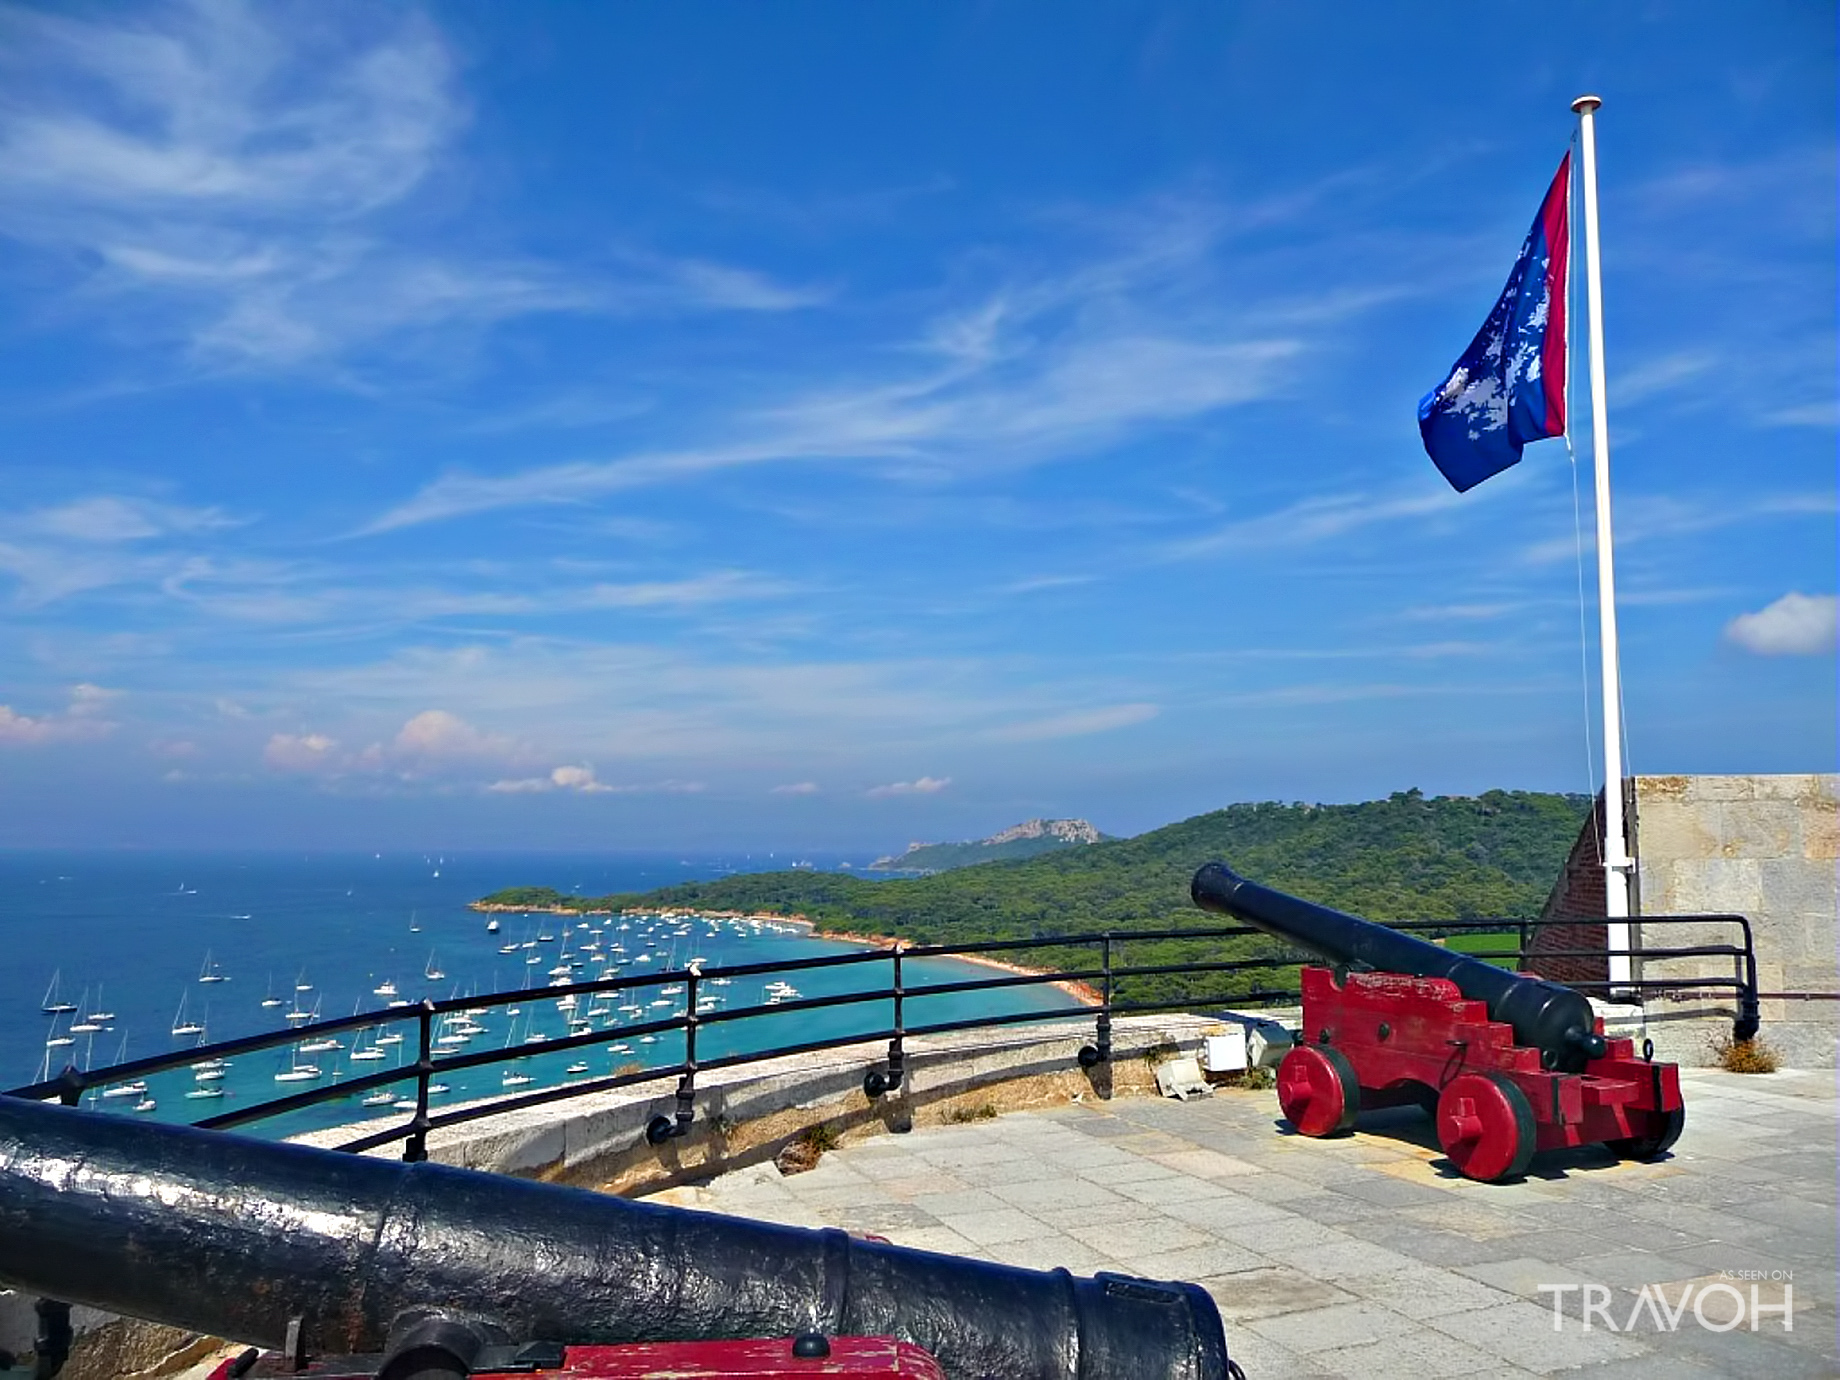 Fort St. Agathe - Porquerolles Island - Chemin Sainte-Agathe, 83400 Hyères, France